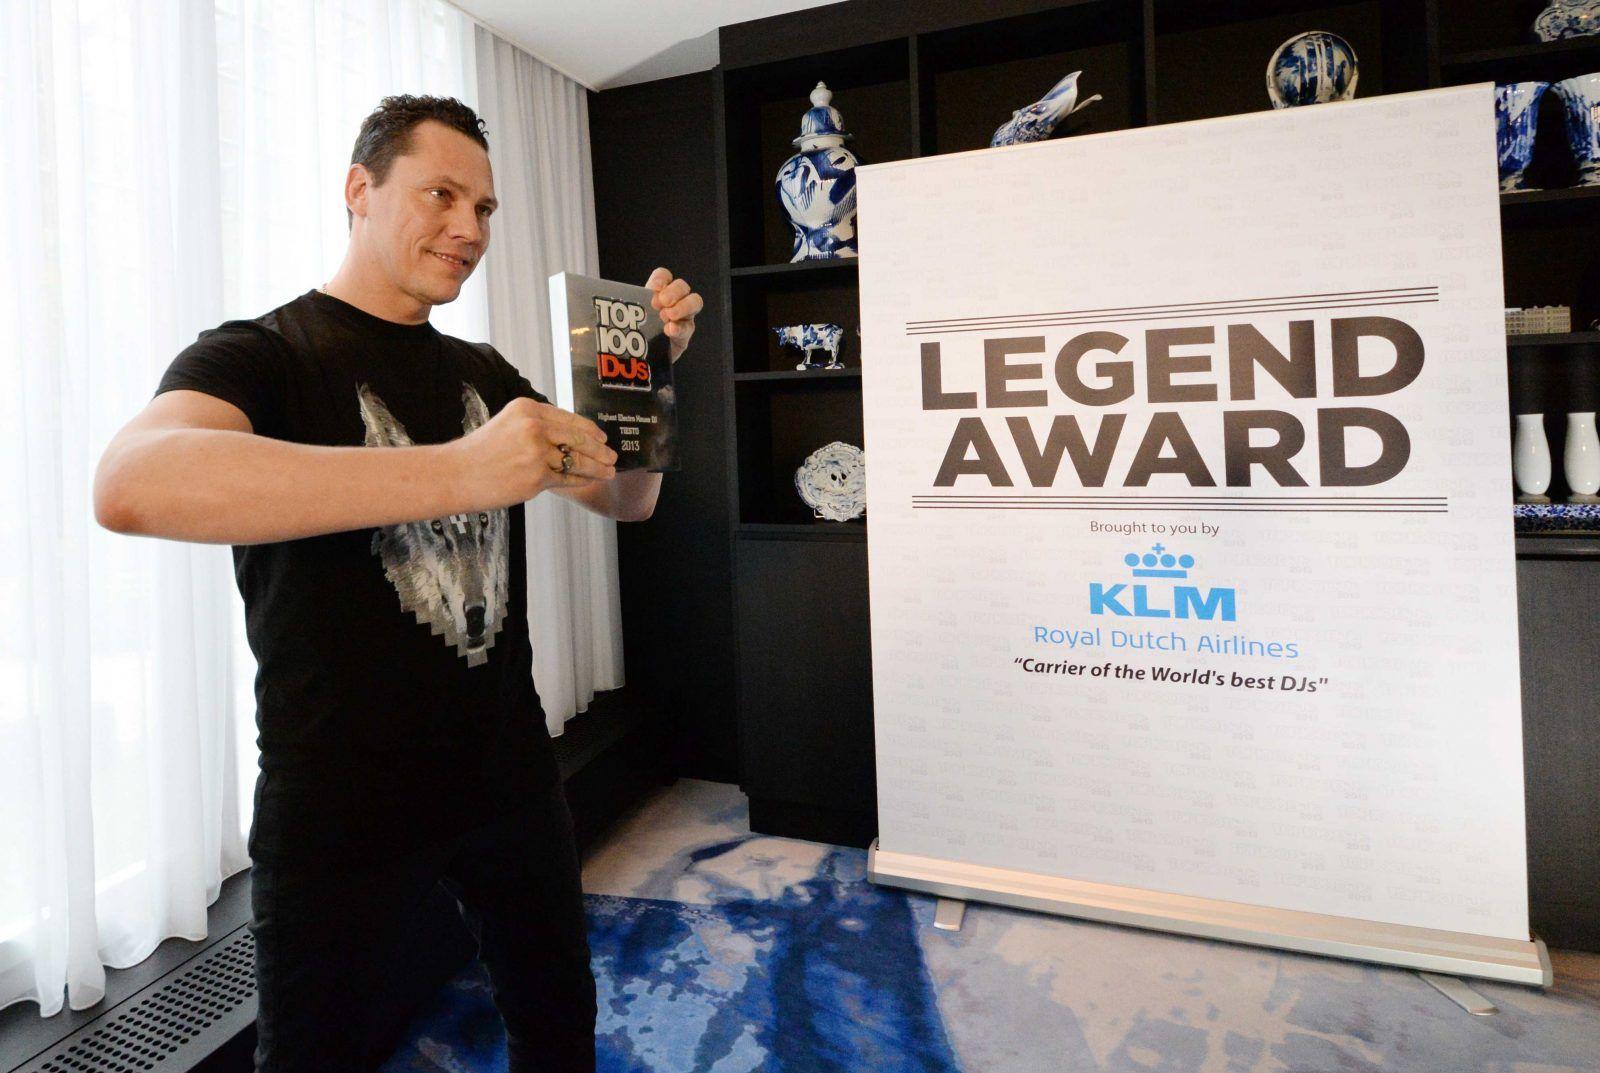 tiesto-klm-dj-legend-award.jpg